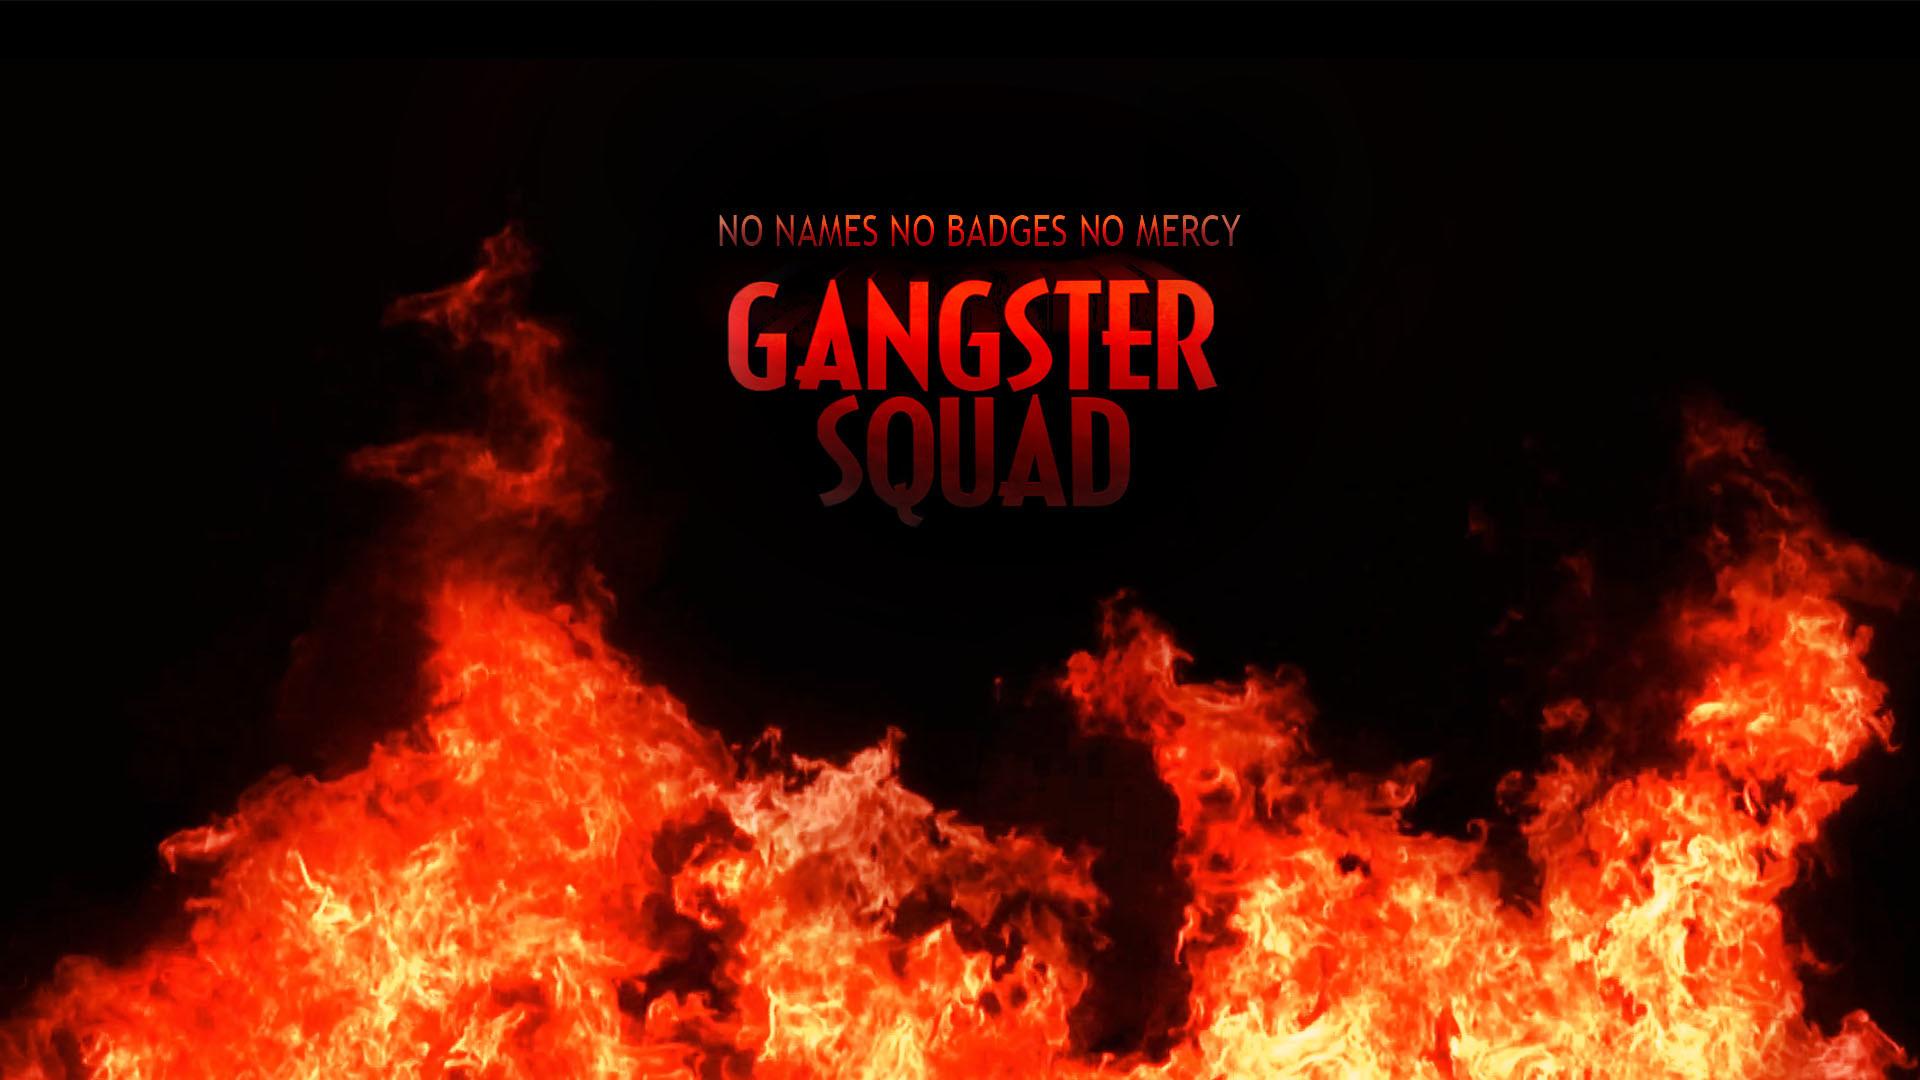 Gangster Wallpaper Gangster squad wallpaper by